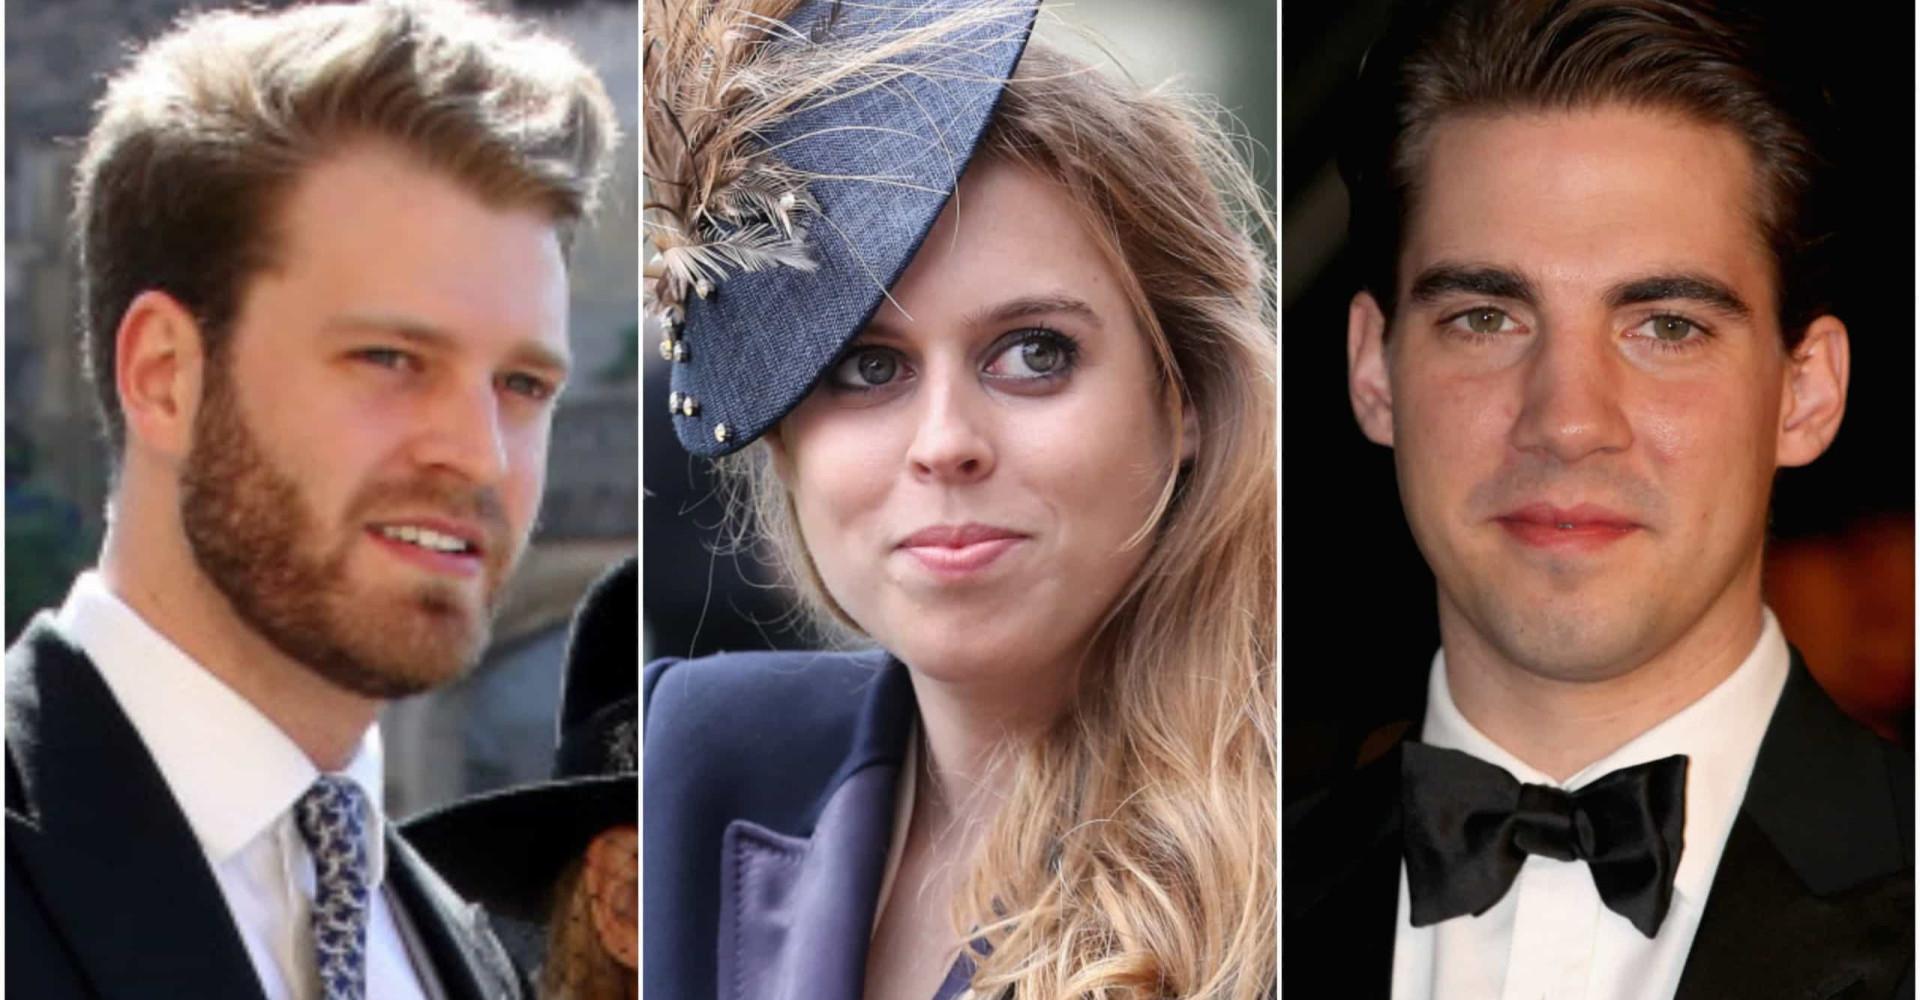 Partidões: 30 membros da realeza e aristocratas solteiros!